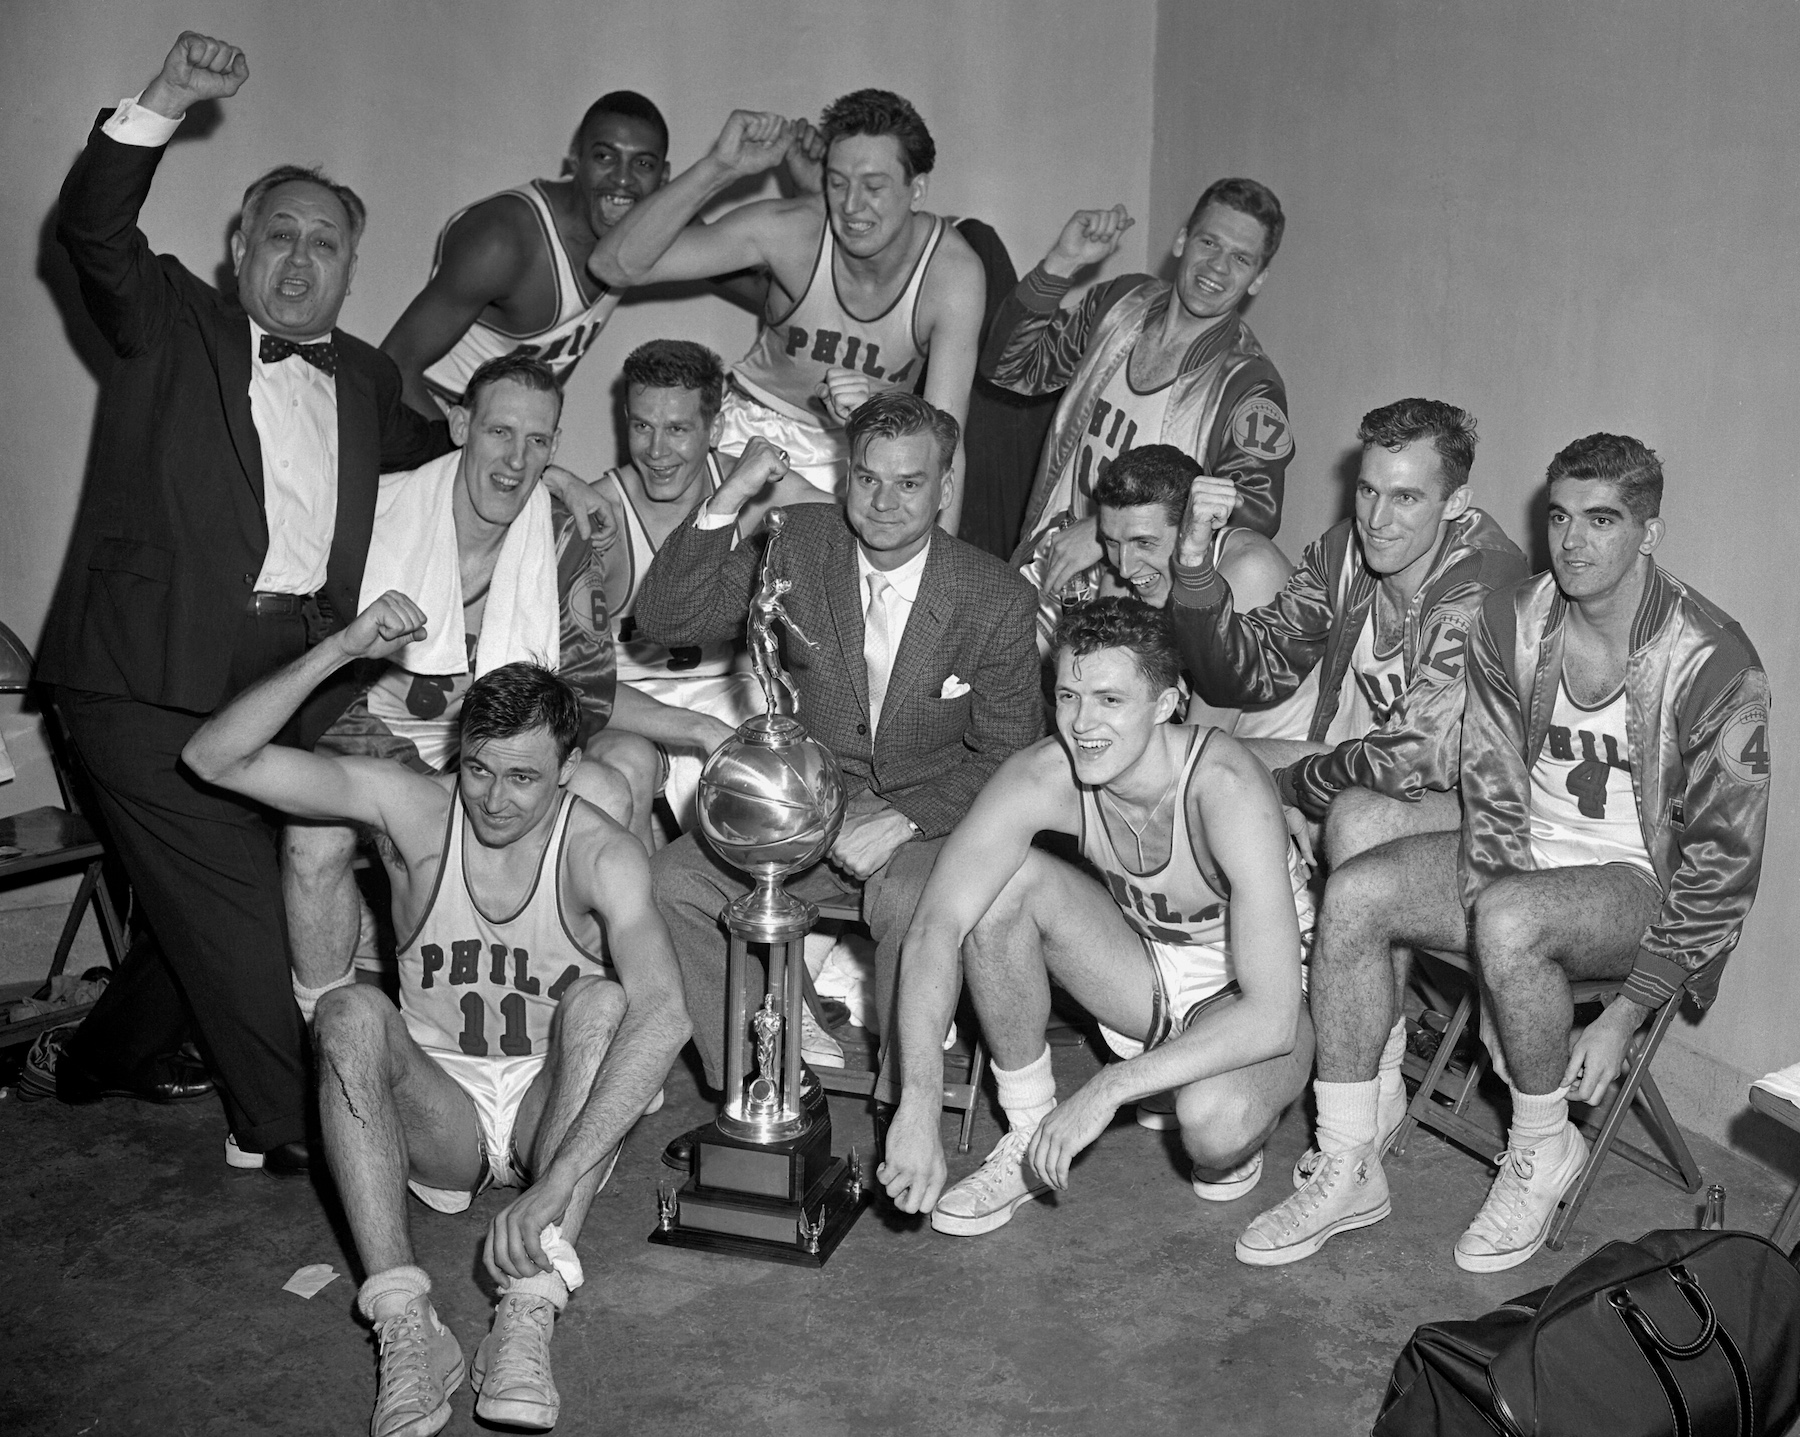 Philly historian scores in bid to have NBA pioneer Eddie Gottlieb honored | Jewish Telegraphic ...